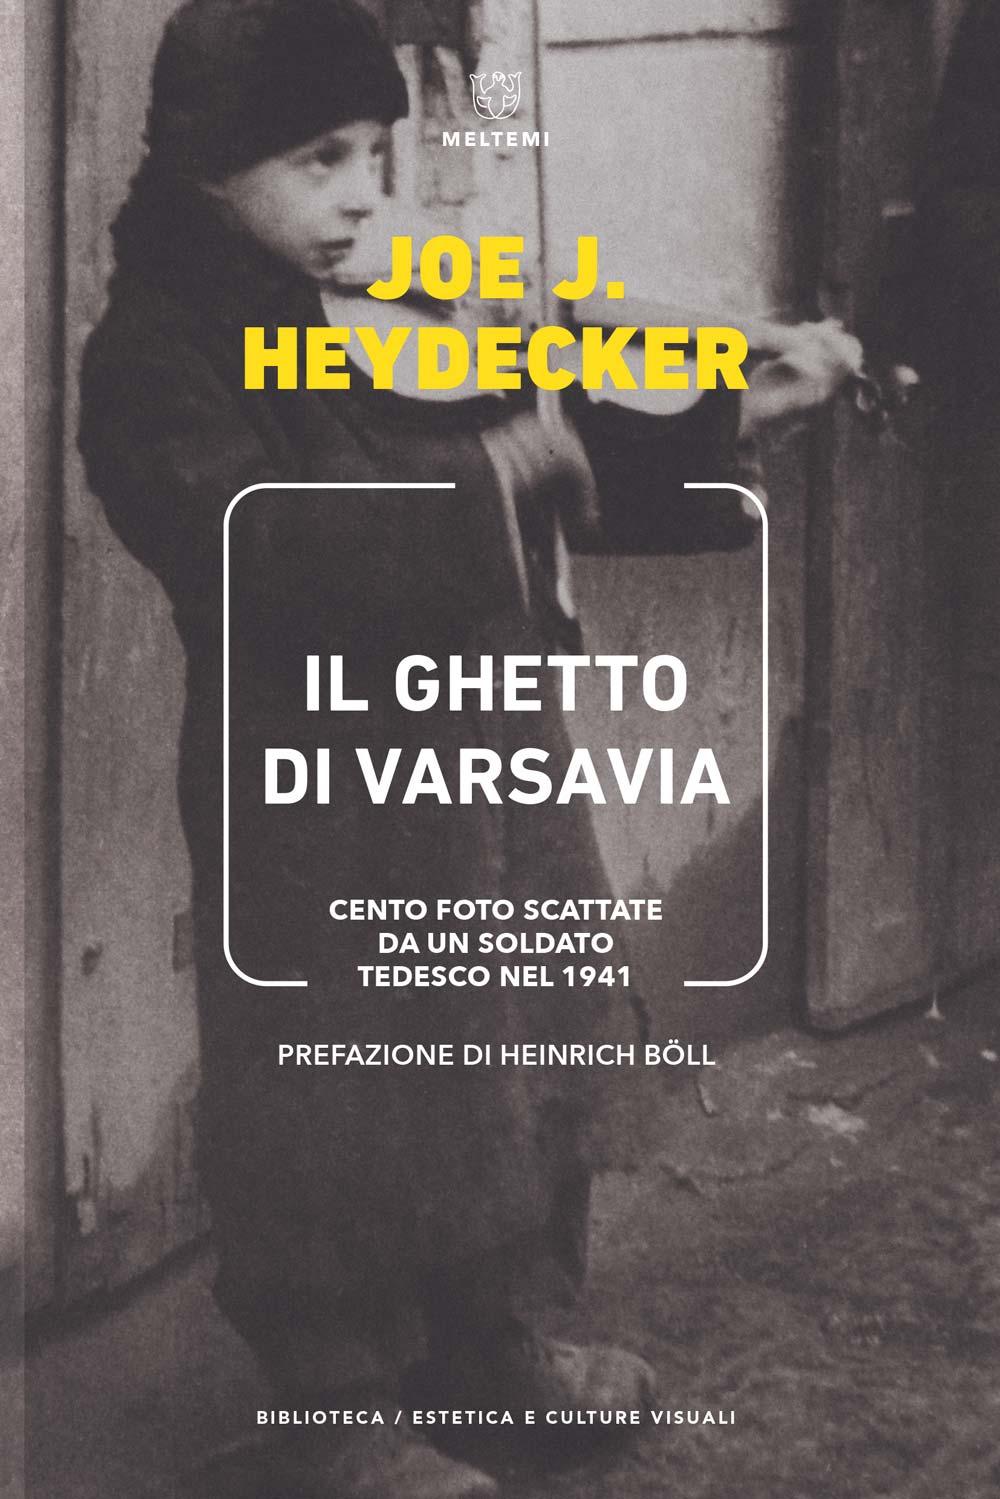 COVER-biblioteca-cult-visuali-heydecker-il-ghetto-di-varsavia